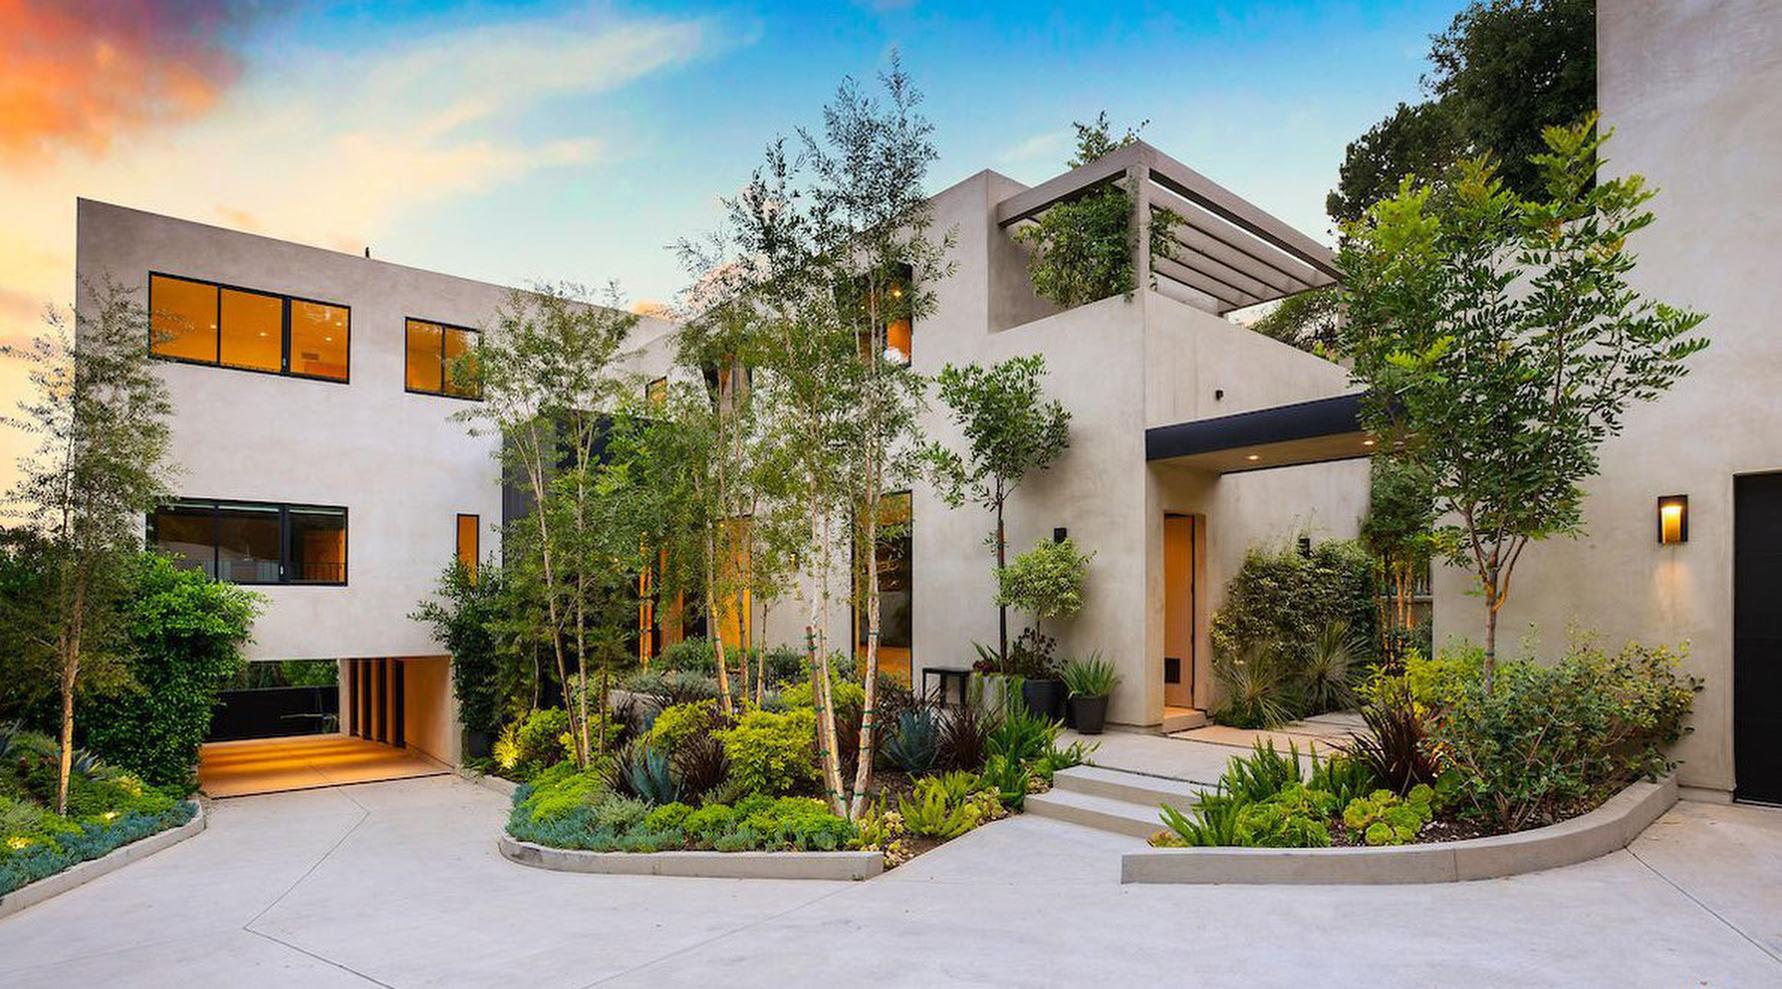 Kylie Jenner and Travis Scott mansion